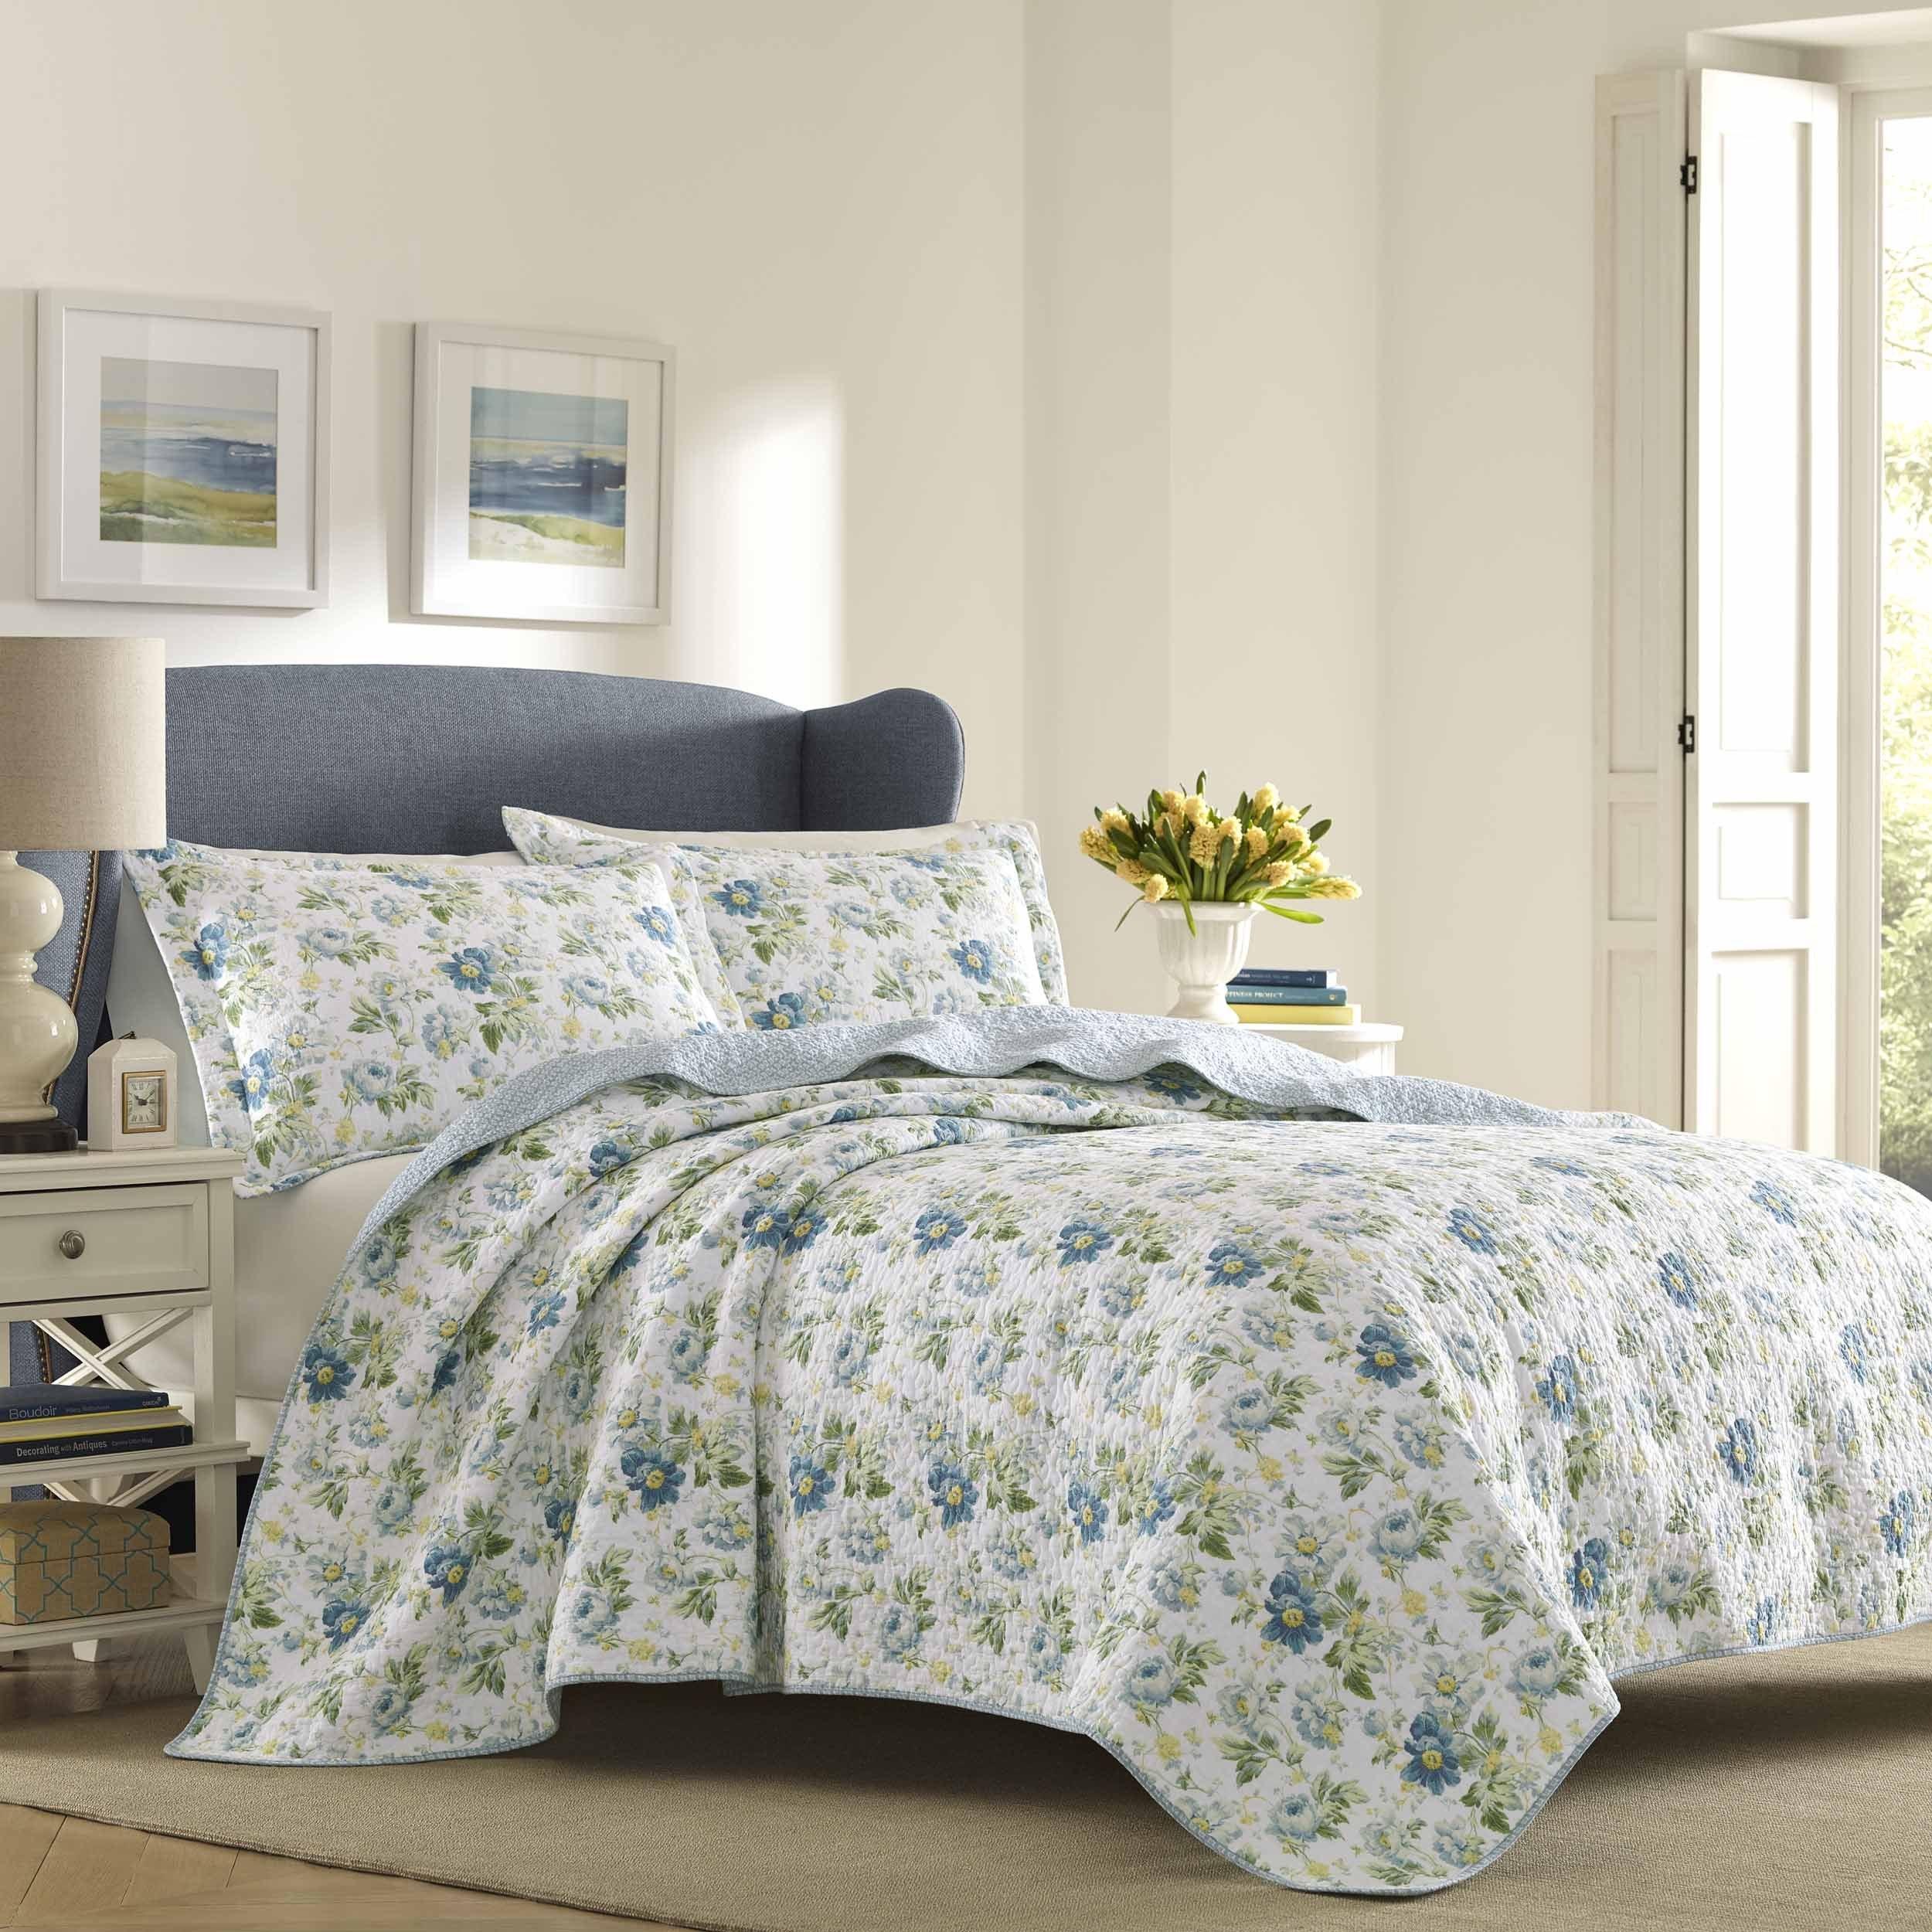 Laura Ashley Peony Garden Quilt Set (Twin), Blue (Cotton,...